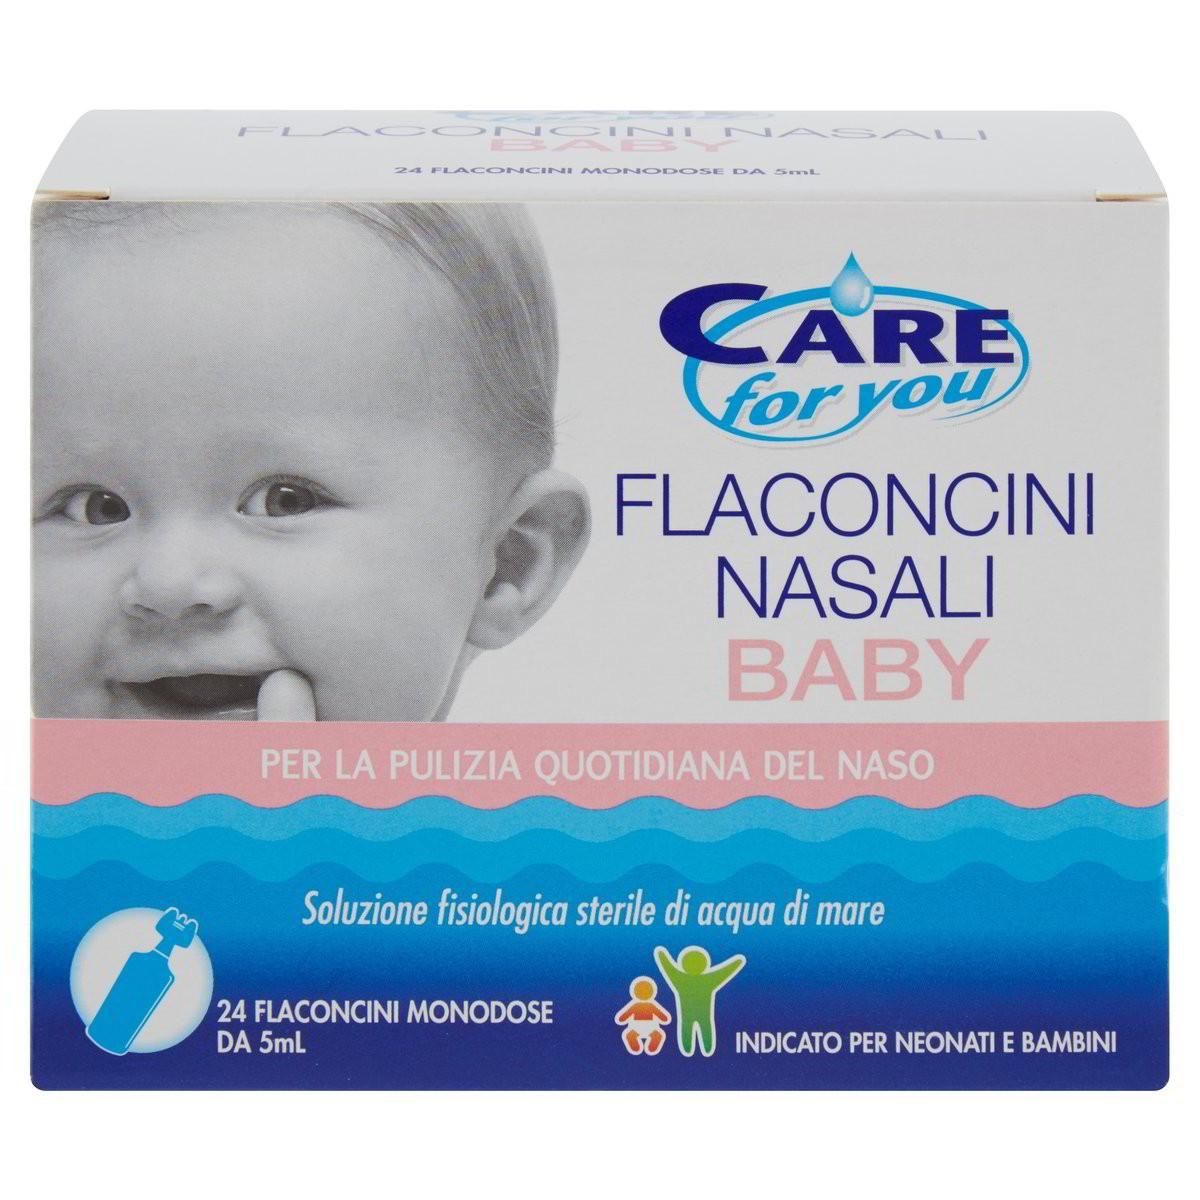 Care for You Flaconcini nasali